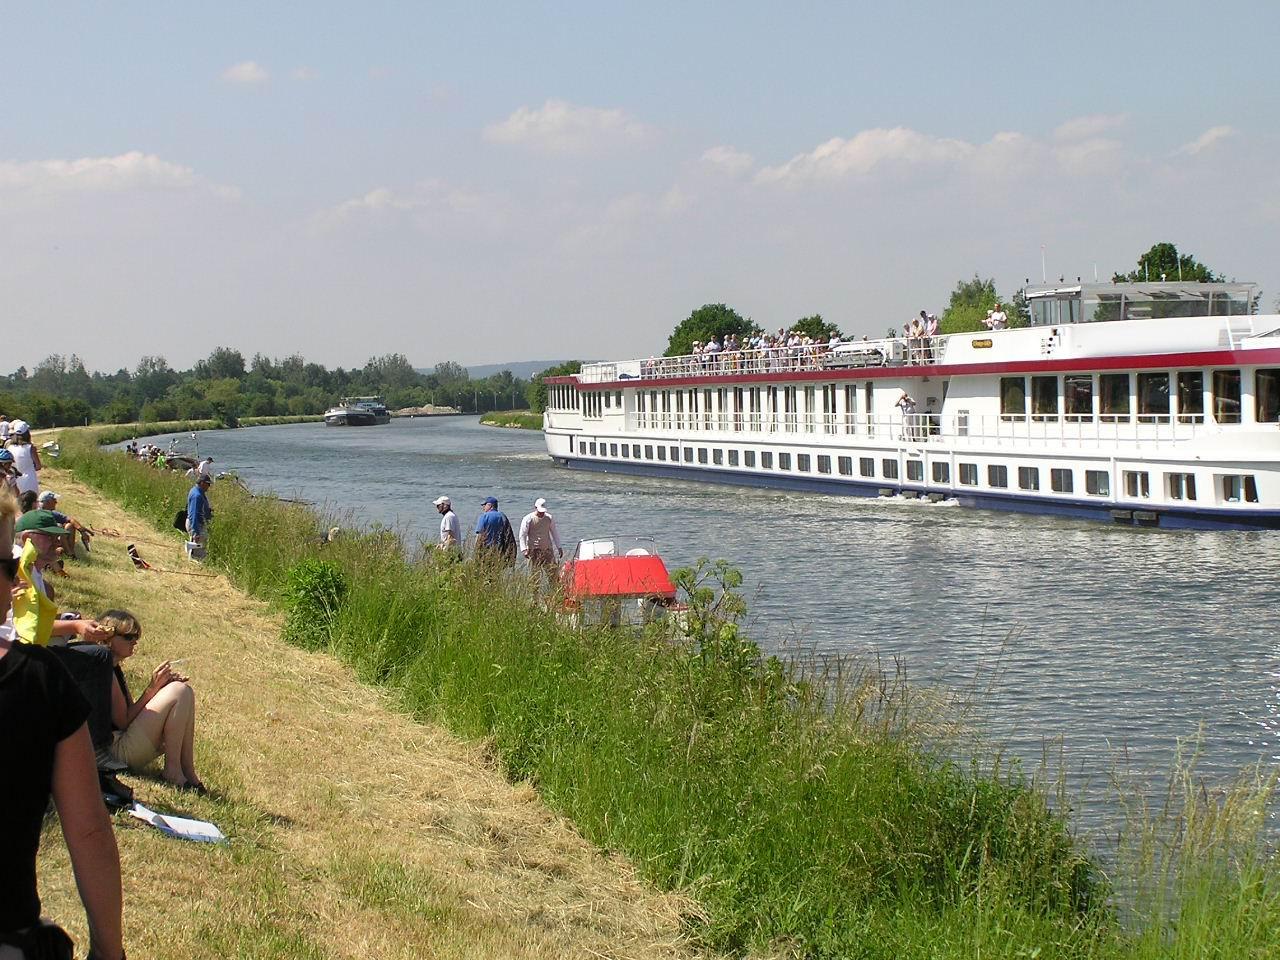 Have hit Canal cruise danube idea useful